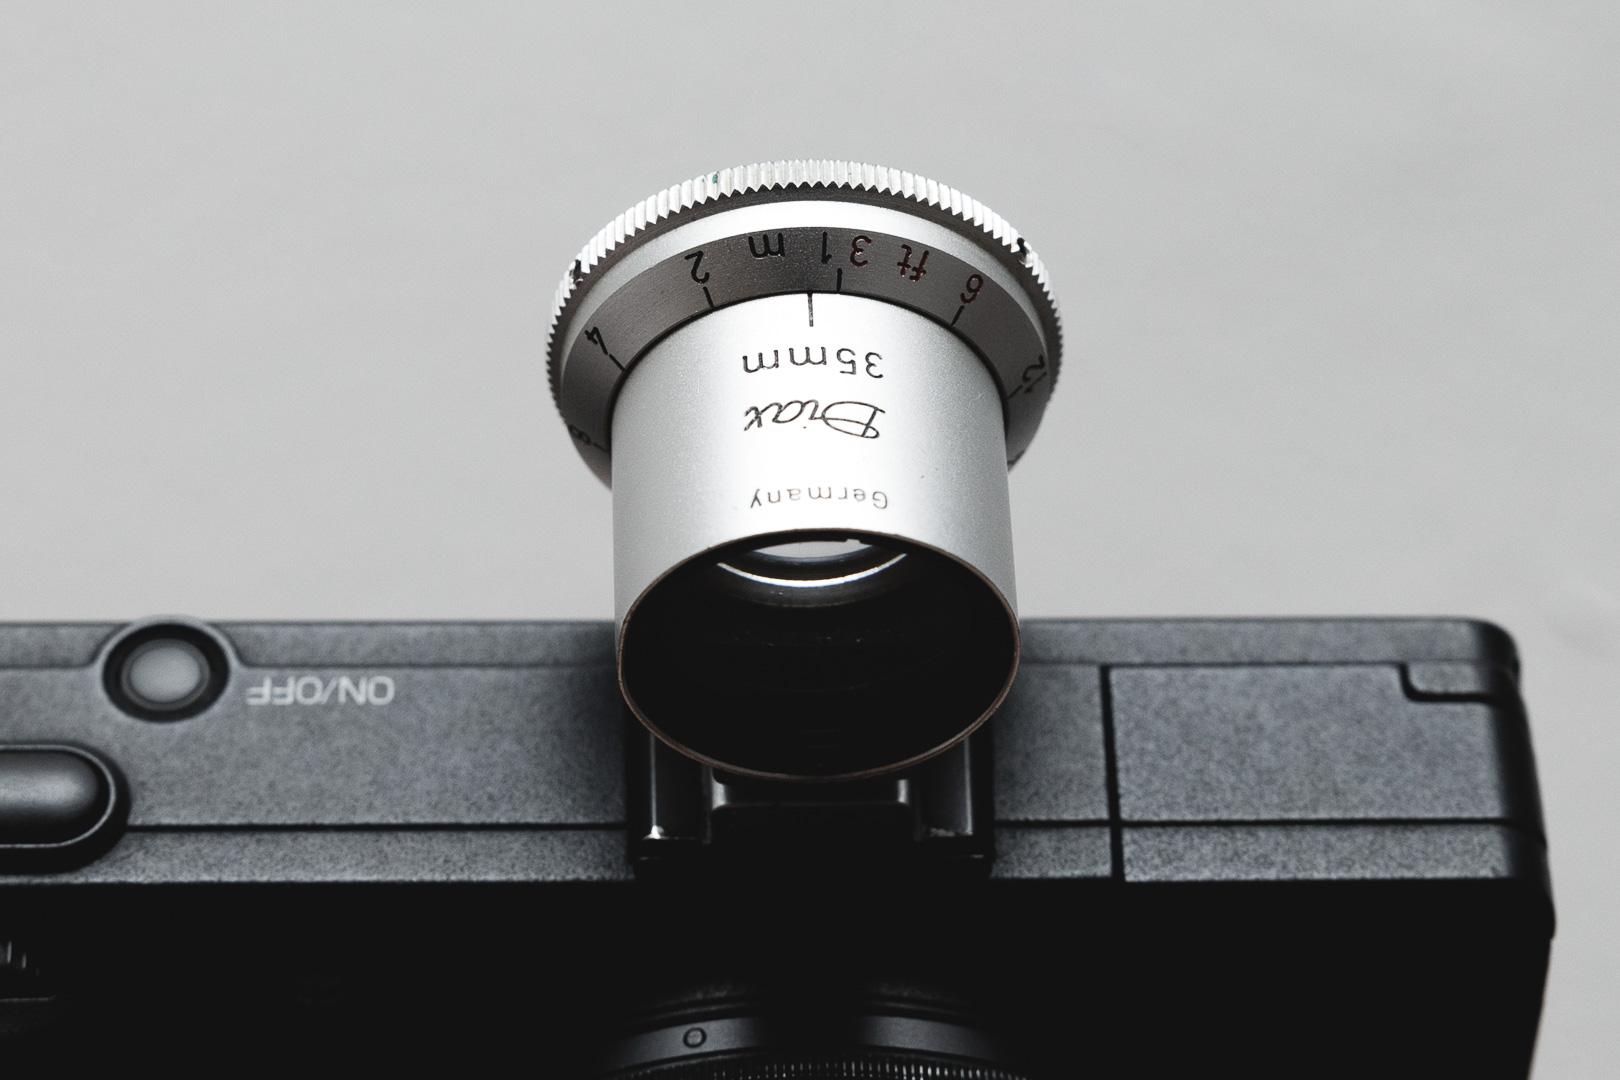 Diax-35mm-finder-Ant Tran-20170402-2978.jpg